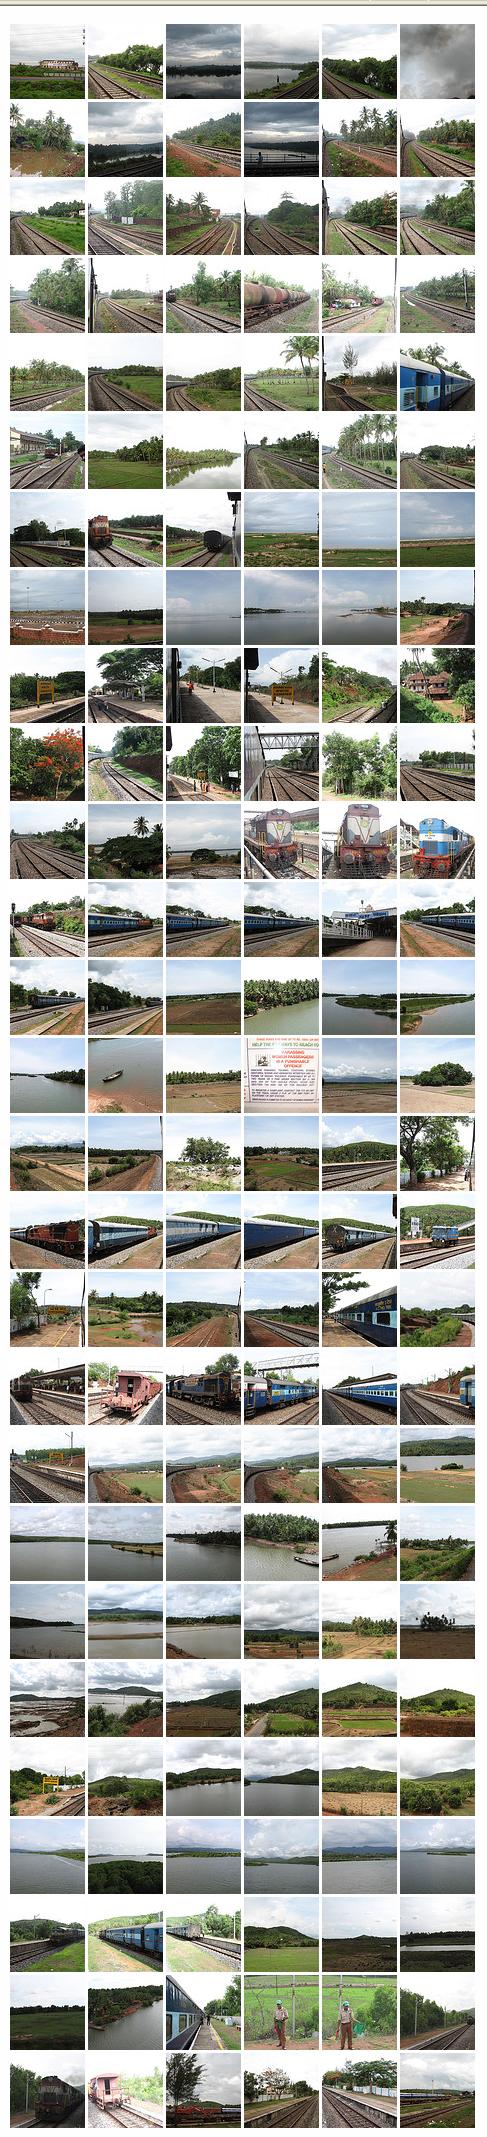 Konkan-Railway-Trip-1 Thumbnails